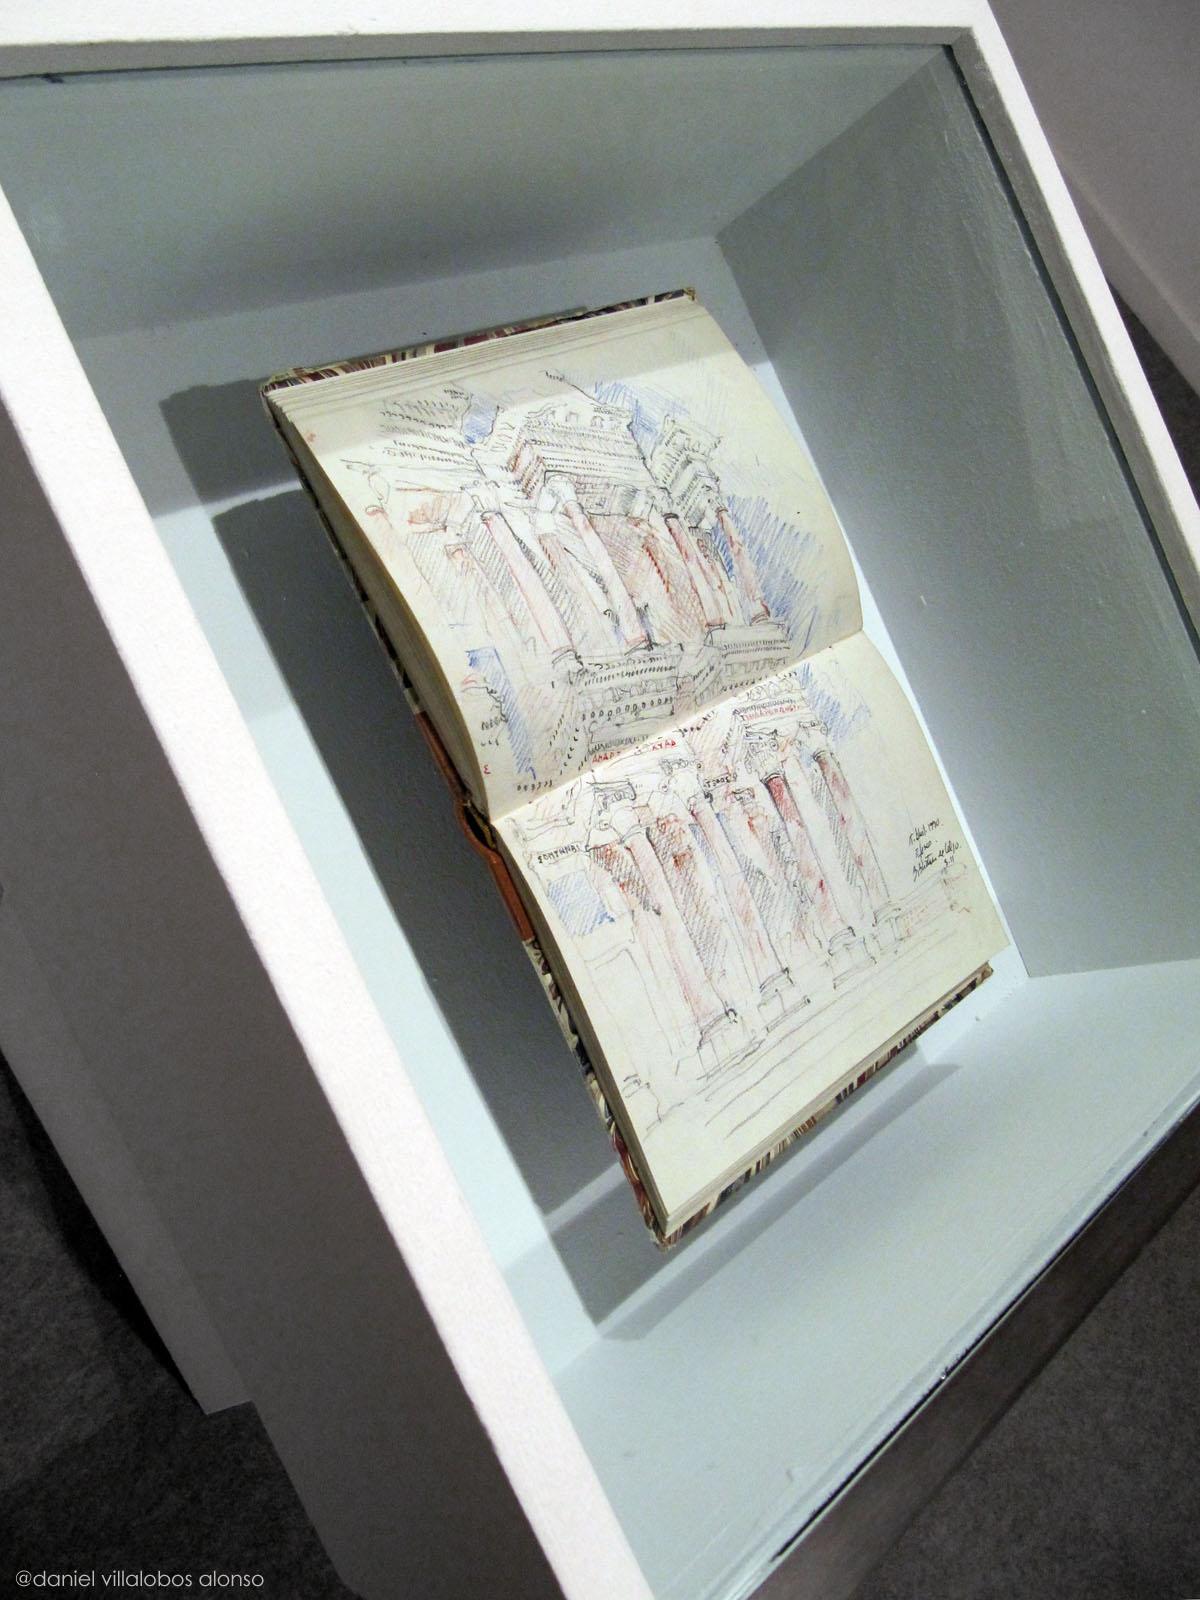 danielvillalobos-miguelelas-josmaraacilu-sketchbooks-skechtravelsexhibition-10